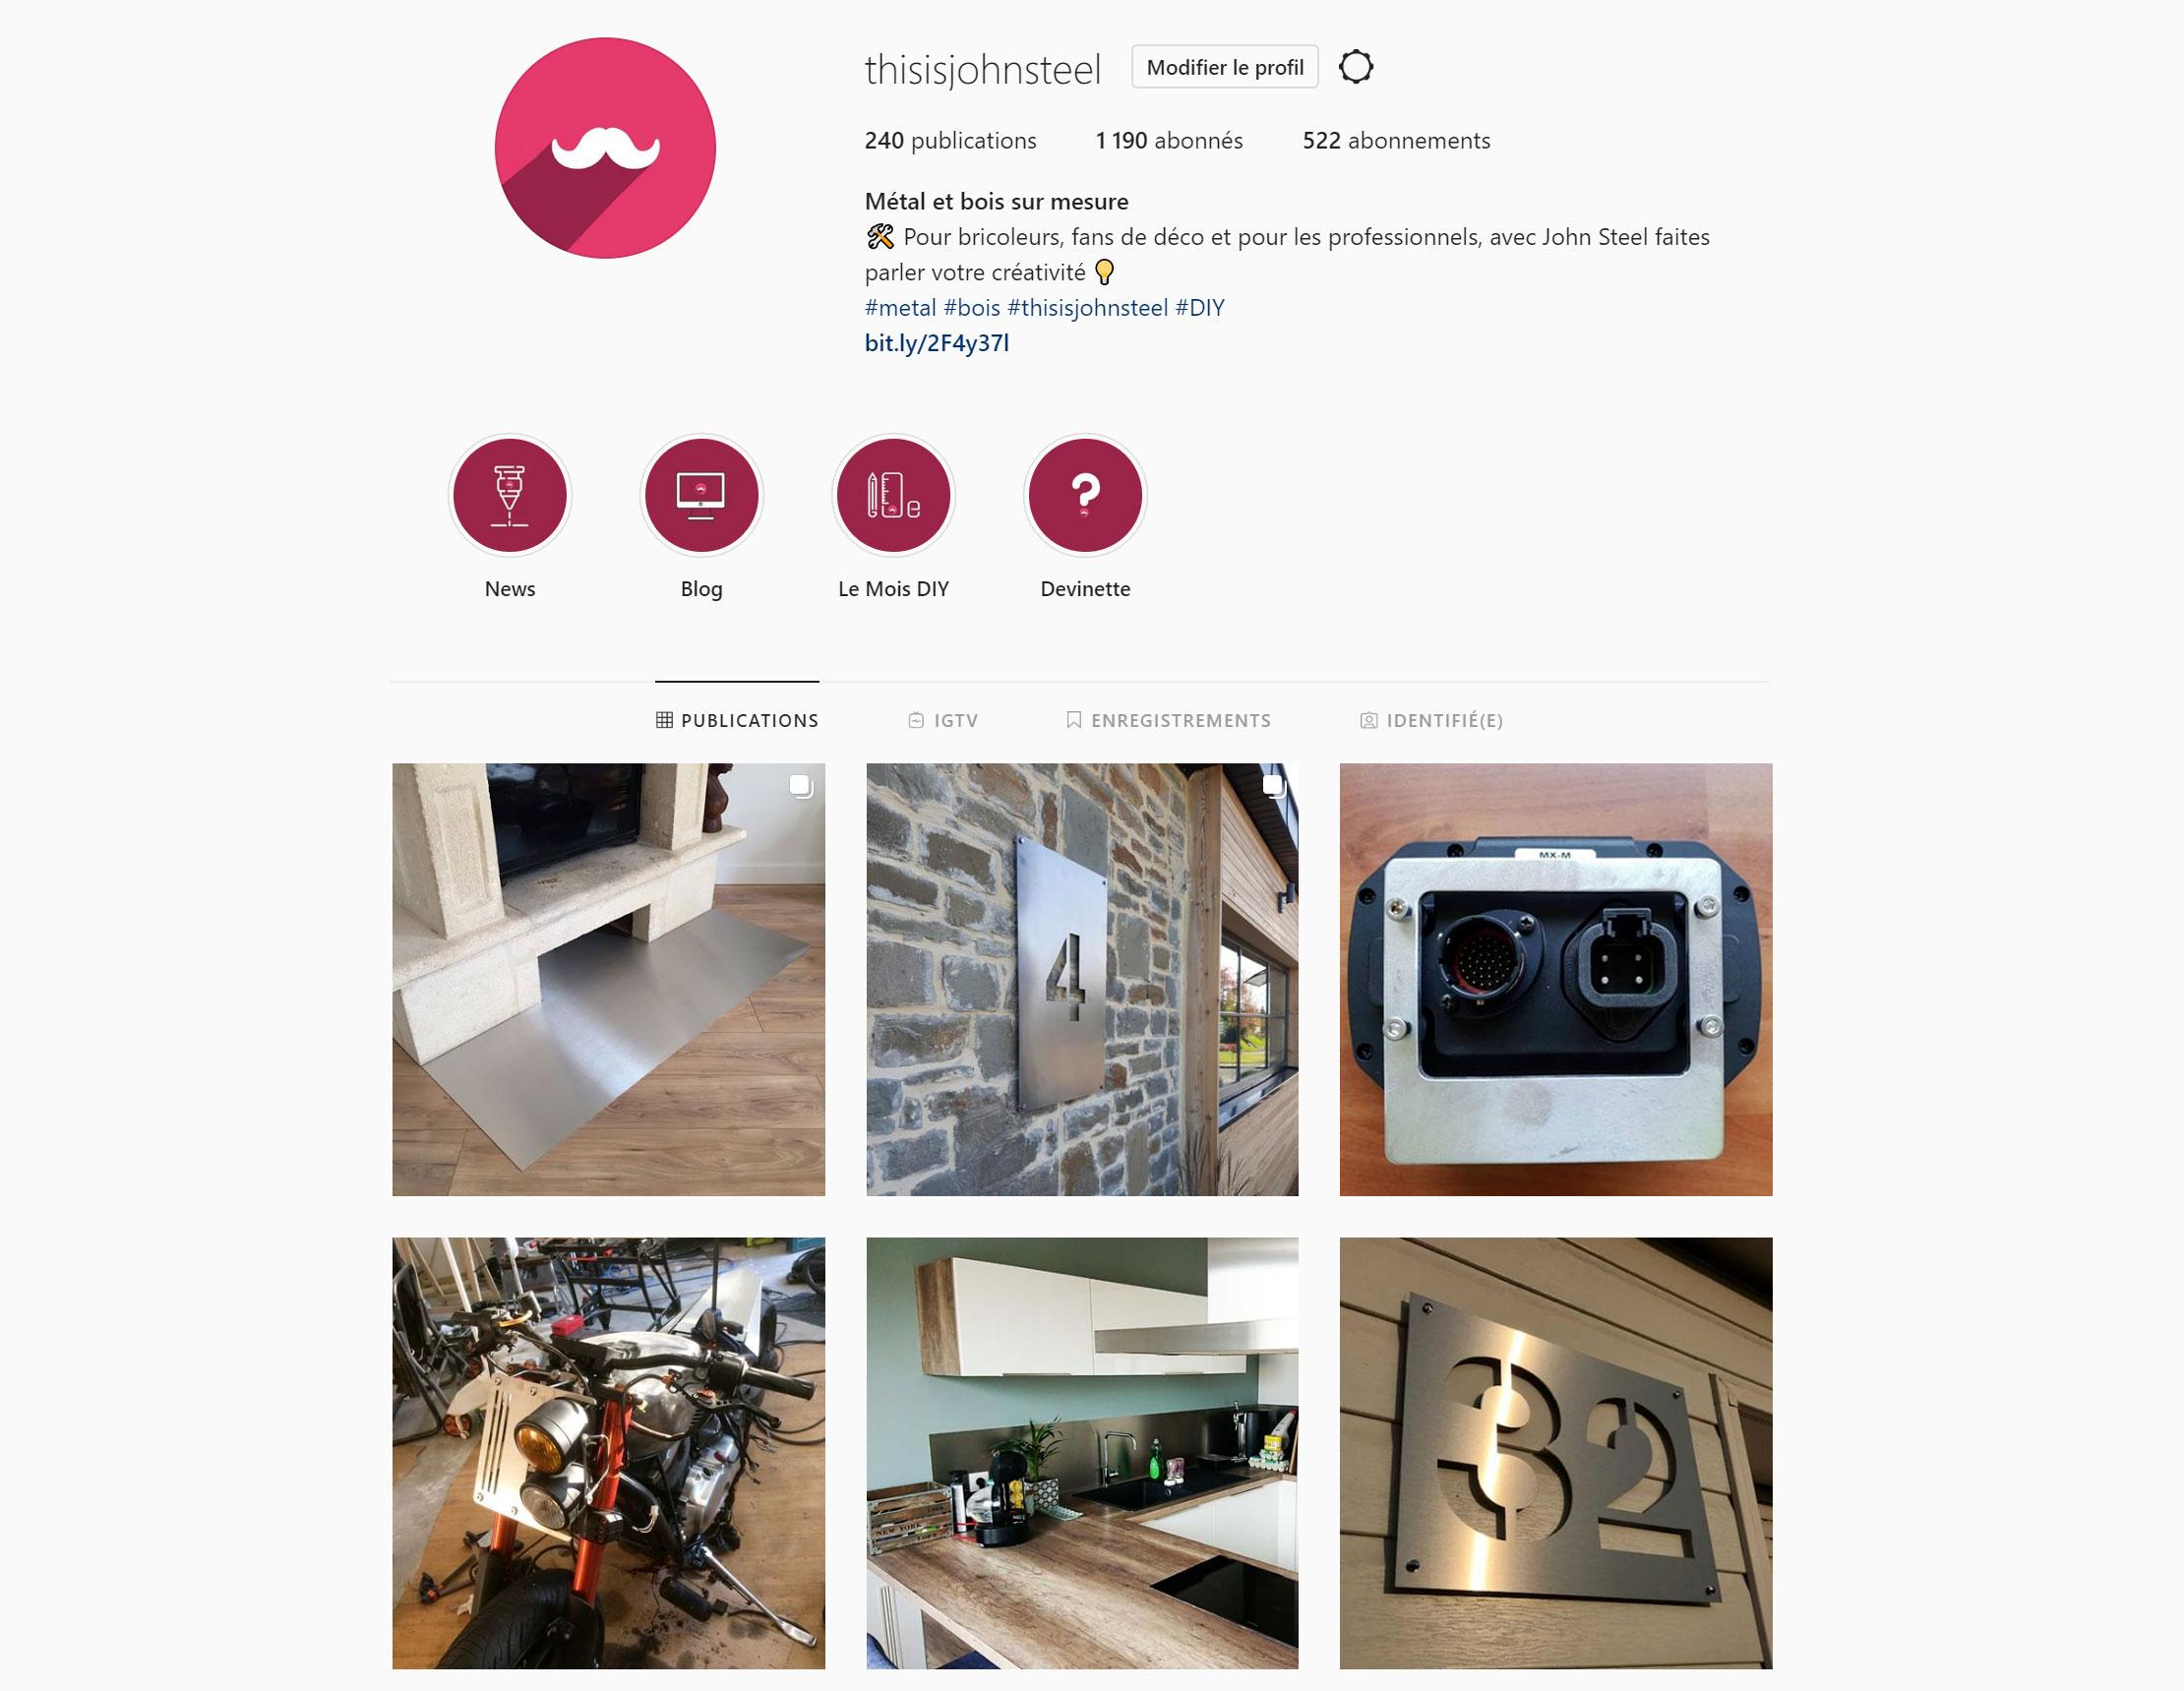 communate-instagram-john-steel